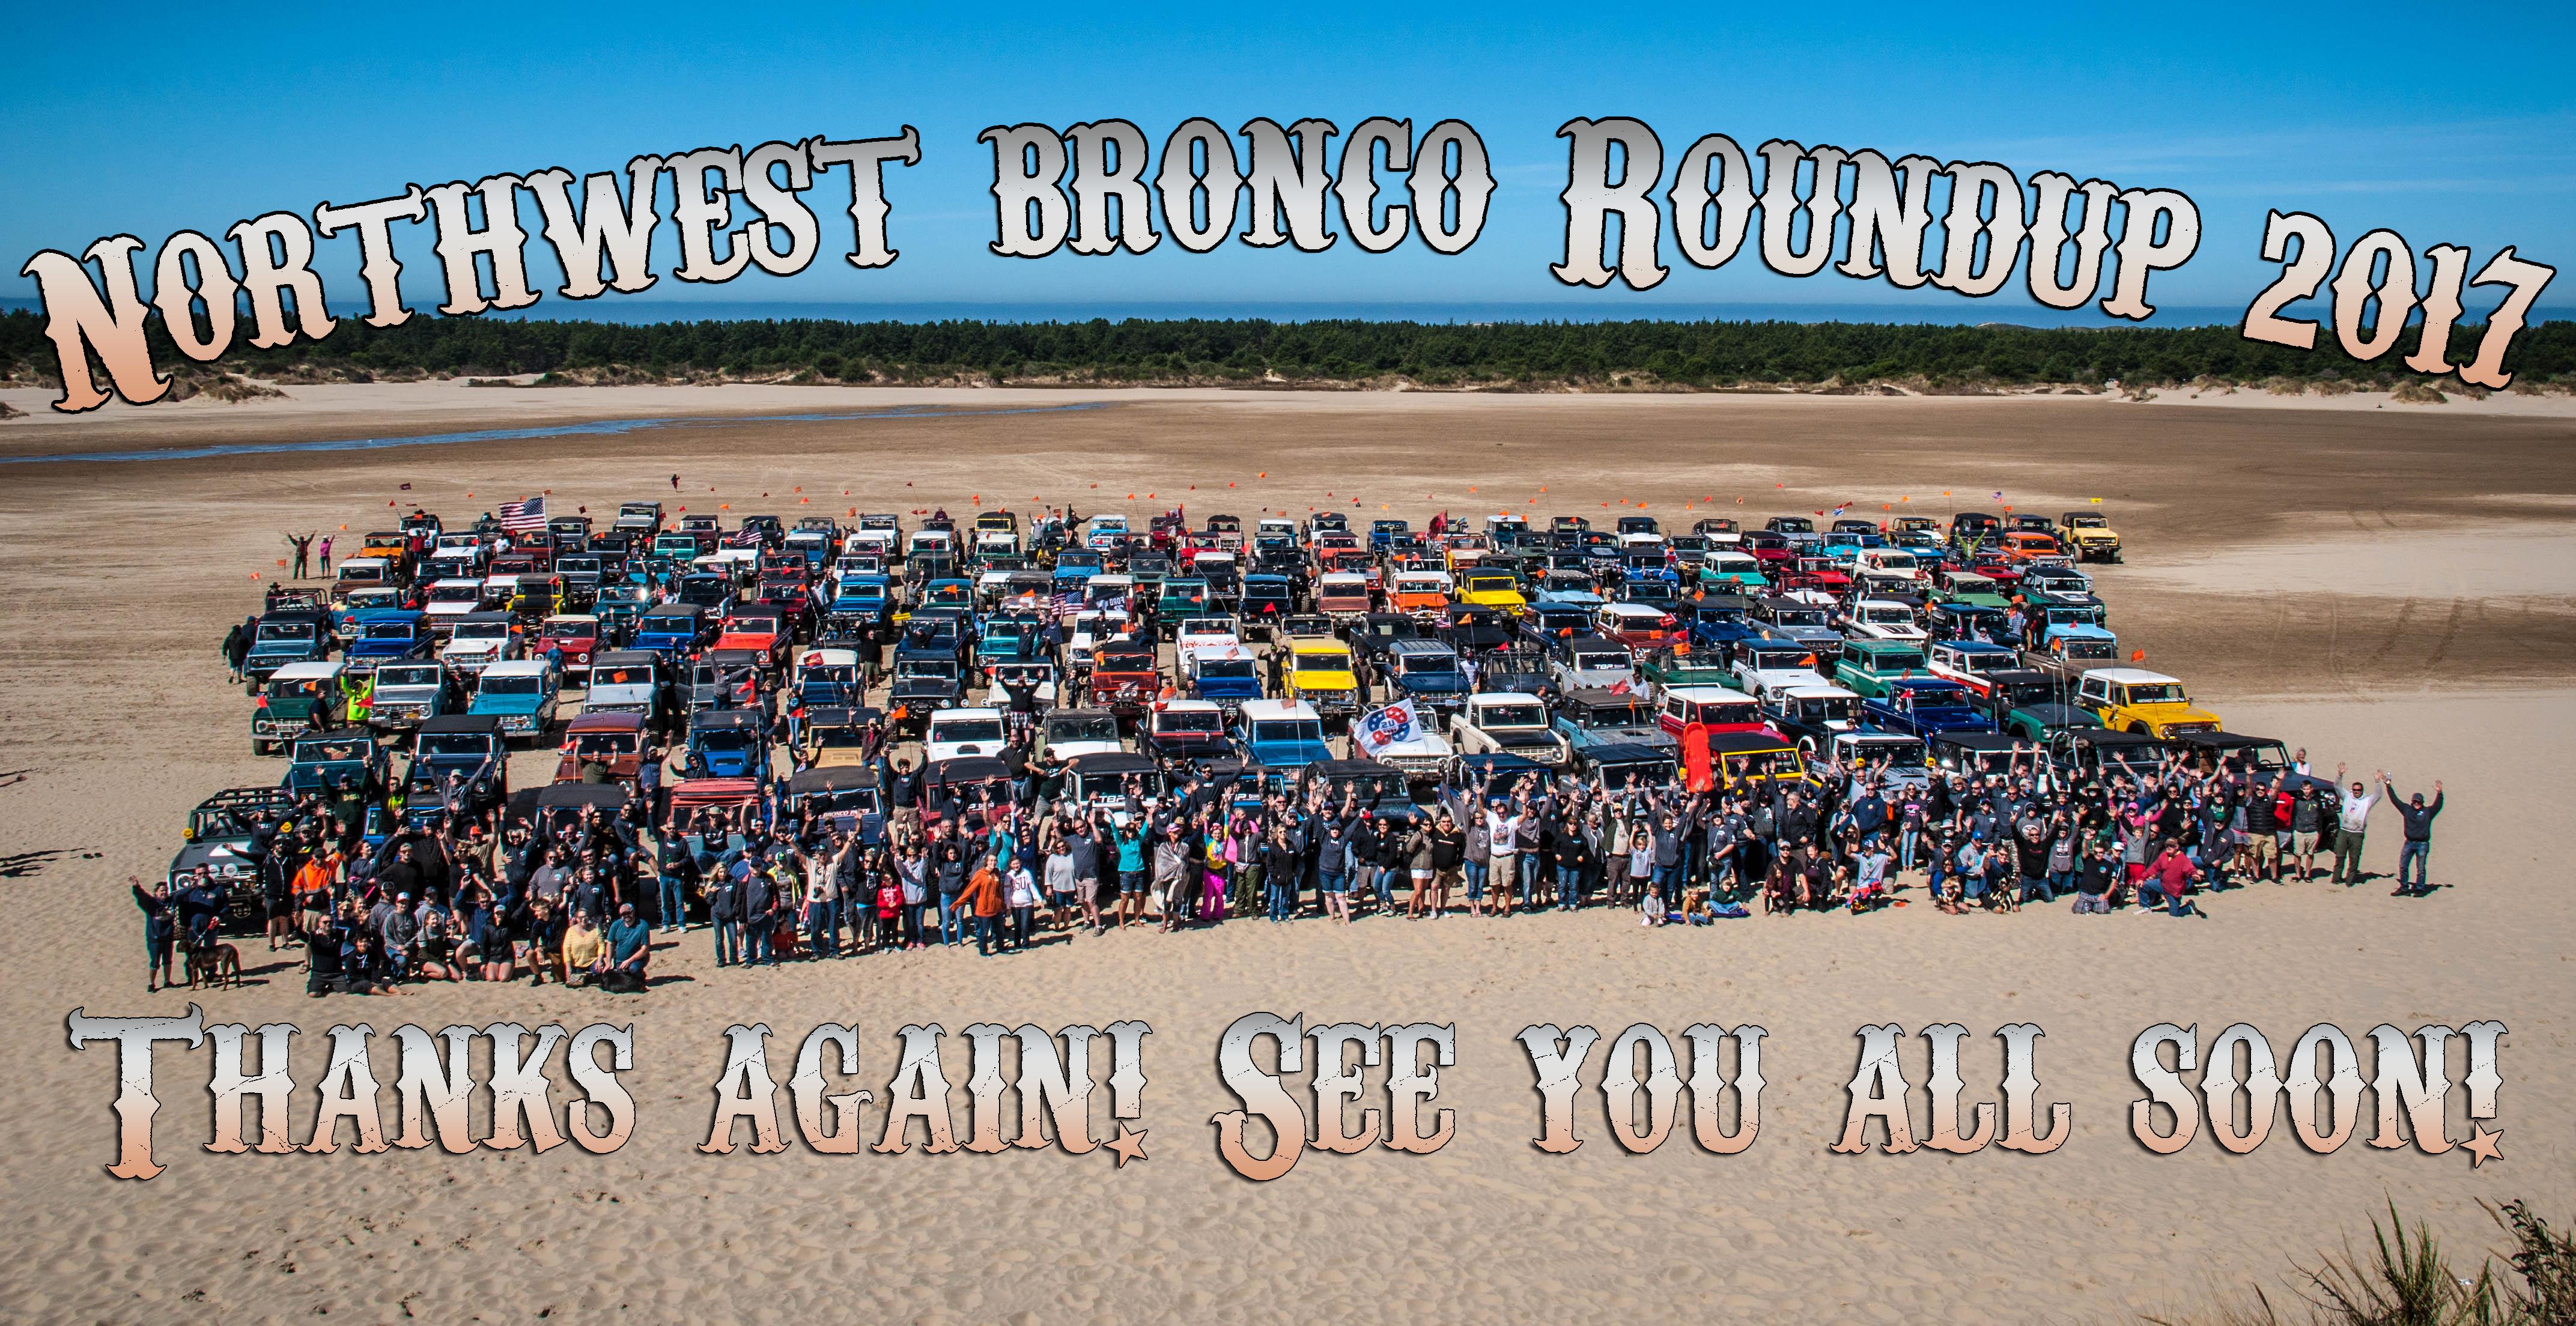 Northwest Bronco Roundup 2017 Beach Photo